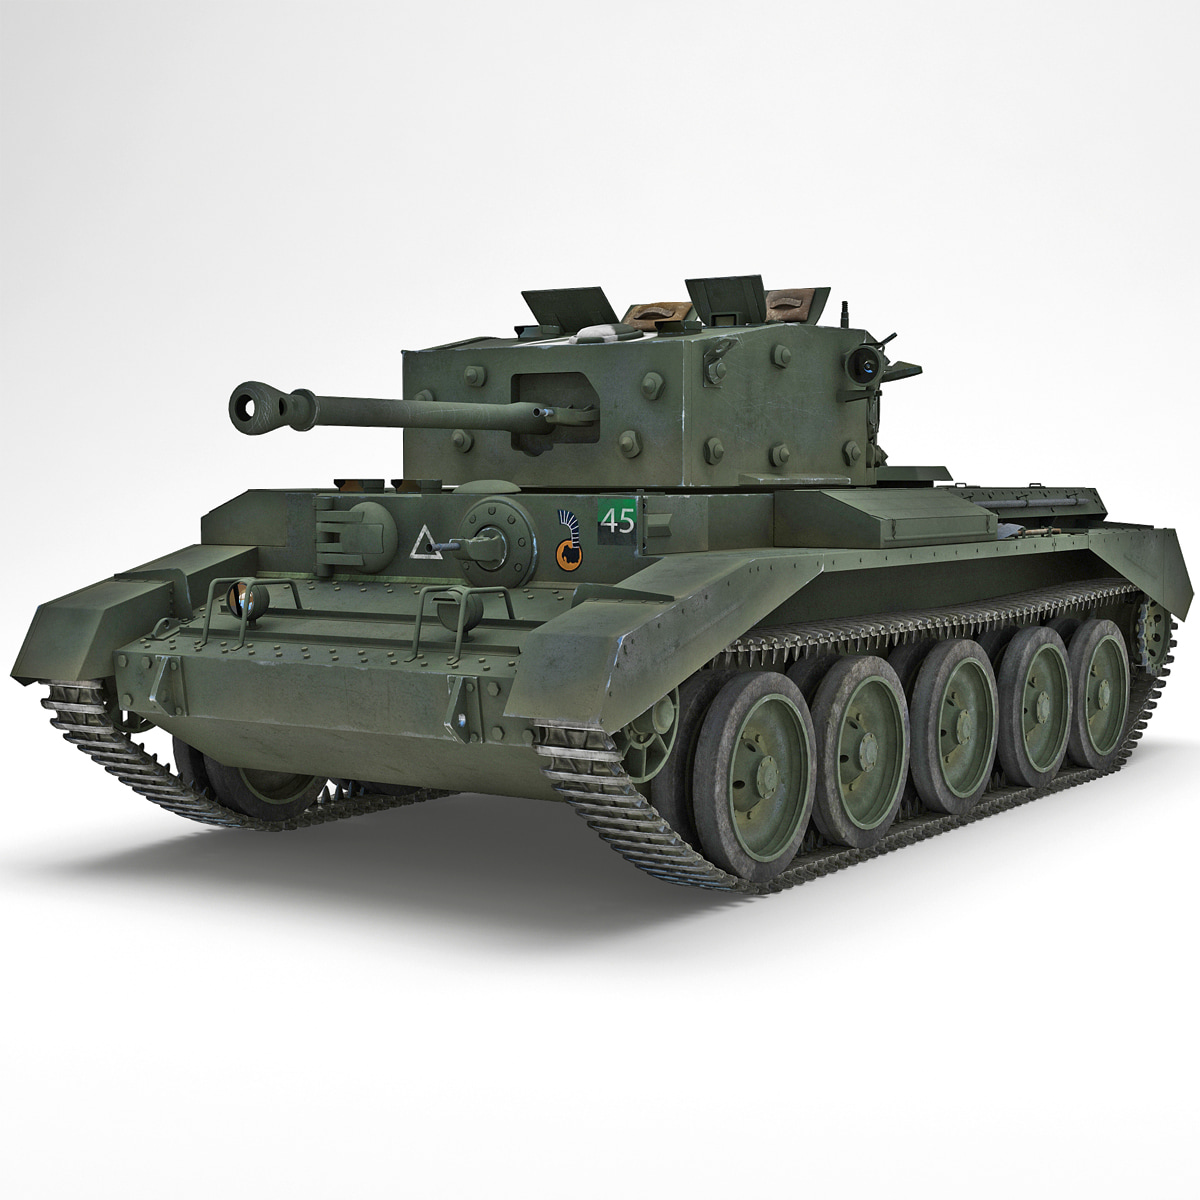 Britain Cruiser WWII Tank Mk VIII Cromwell Green Rigged_2.jpg